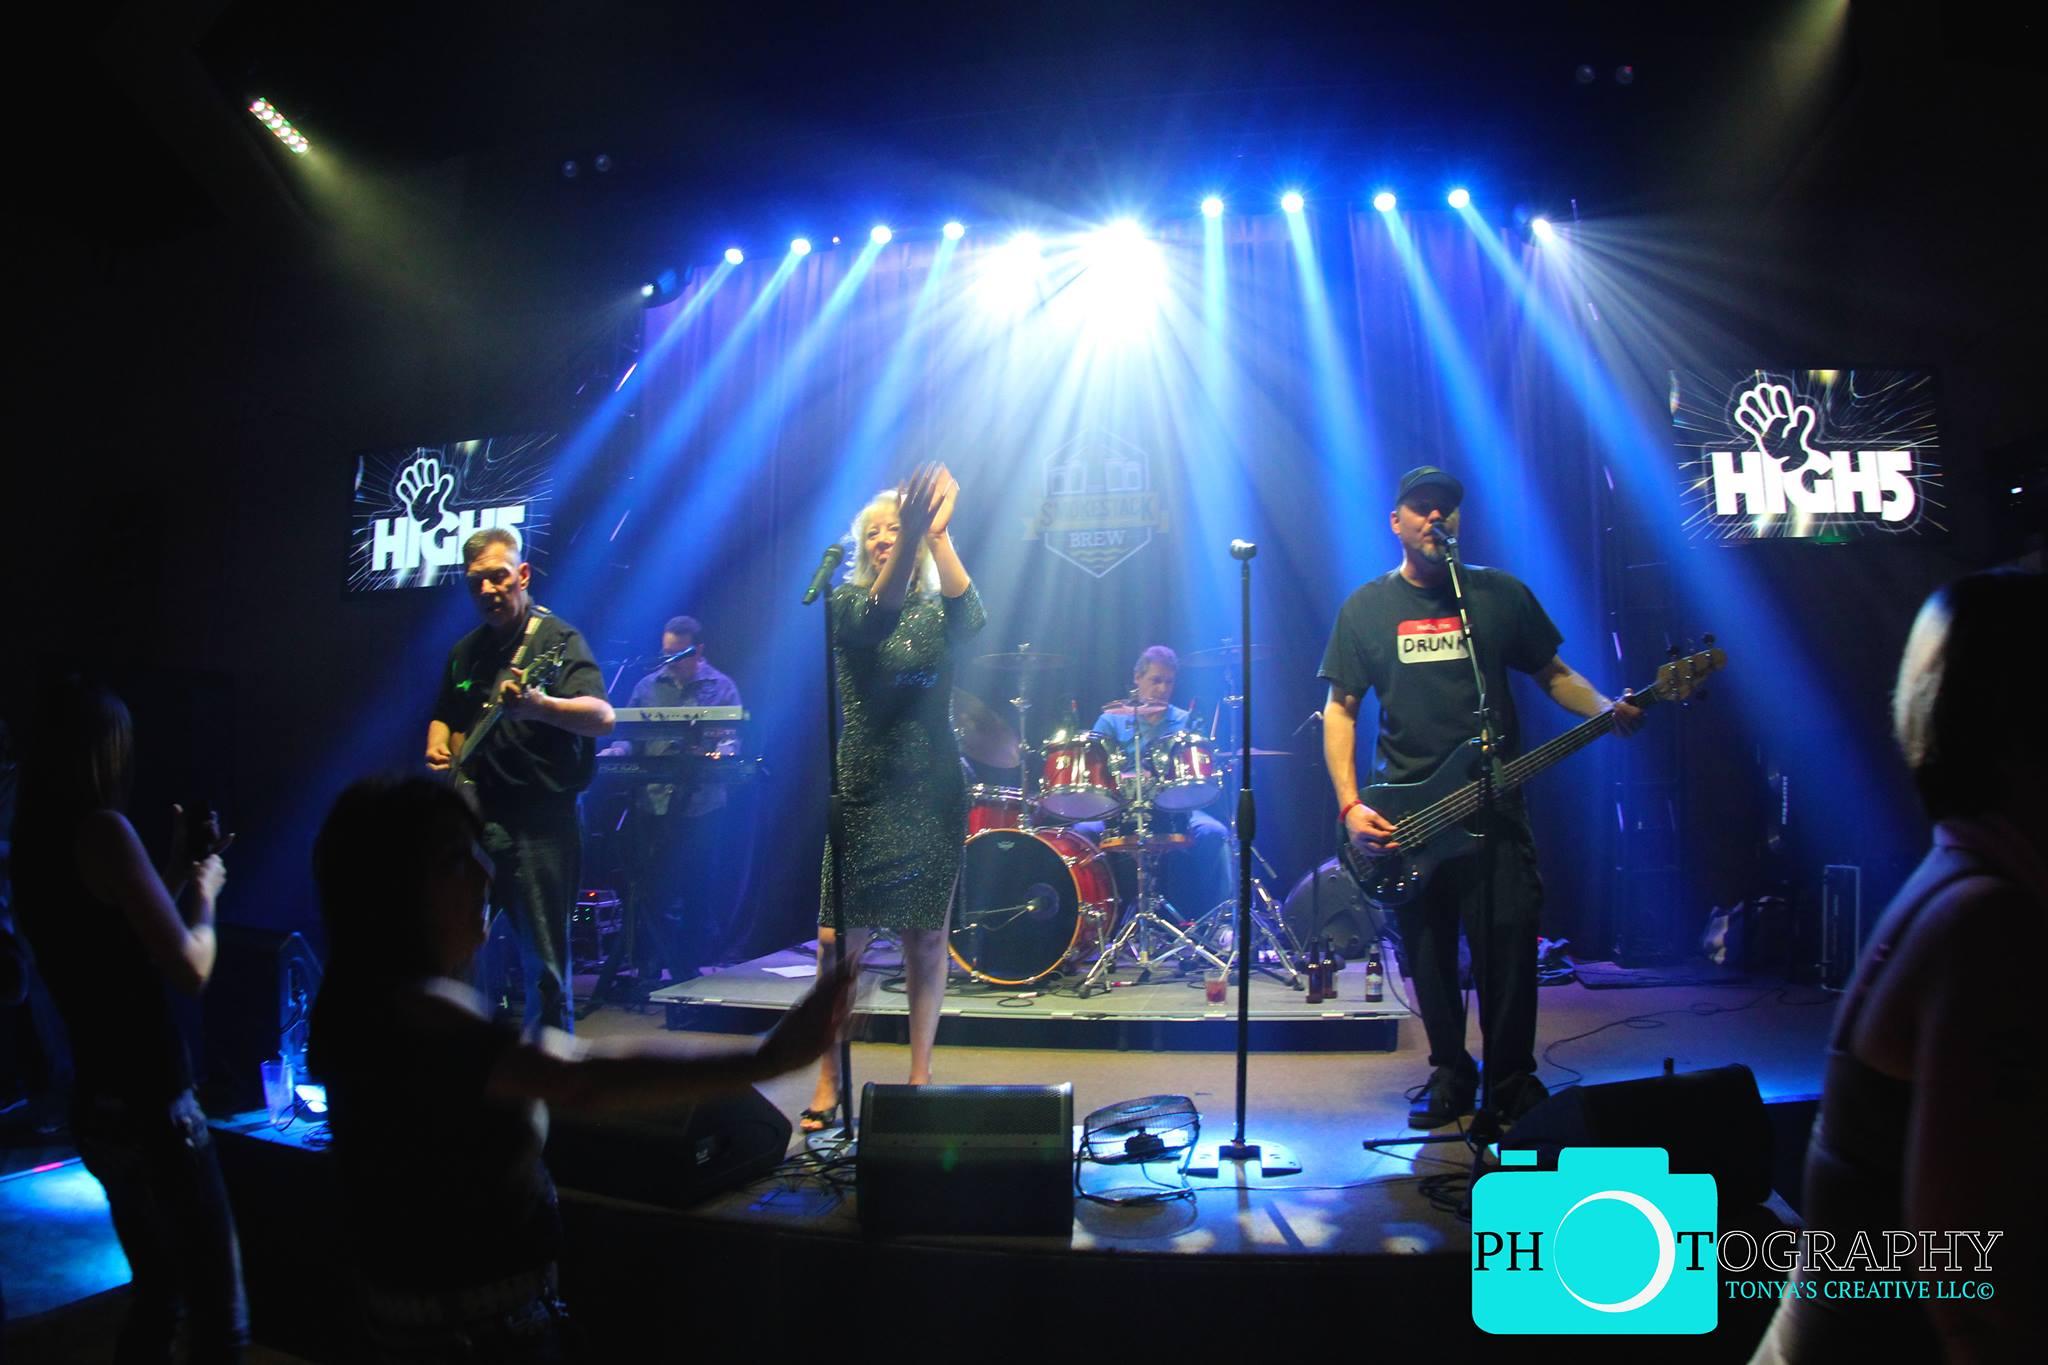 Live Music- High 5